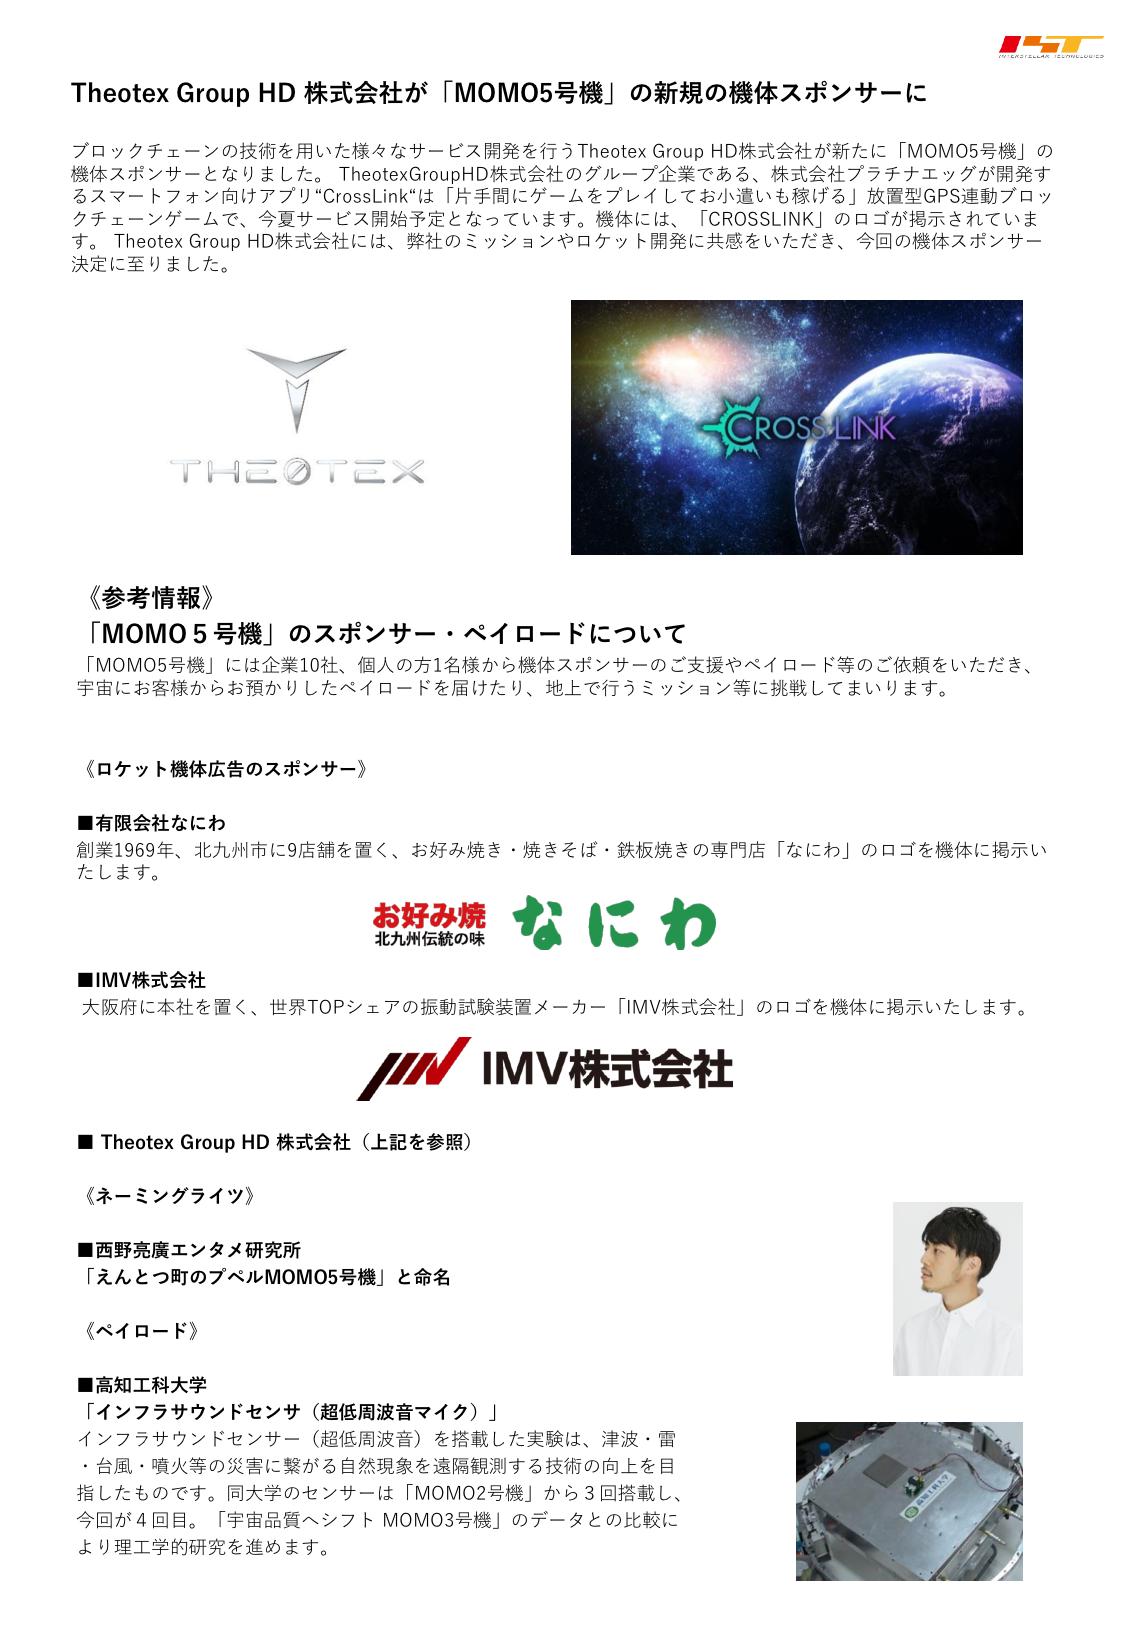 f:id:Imamura:20200603233342p:plain